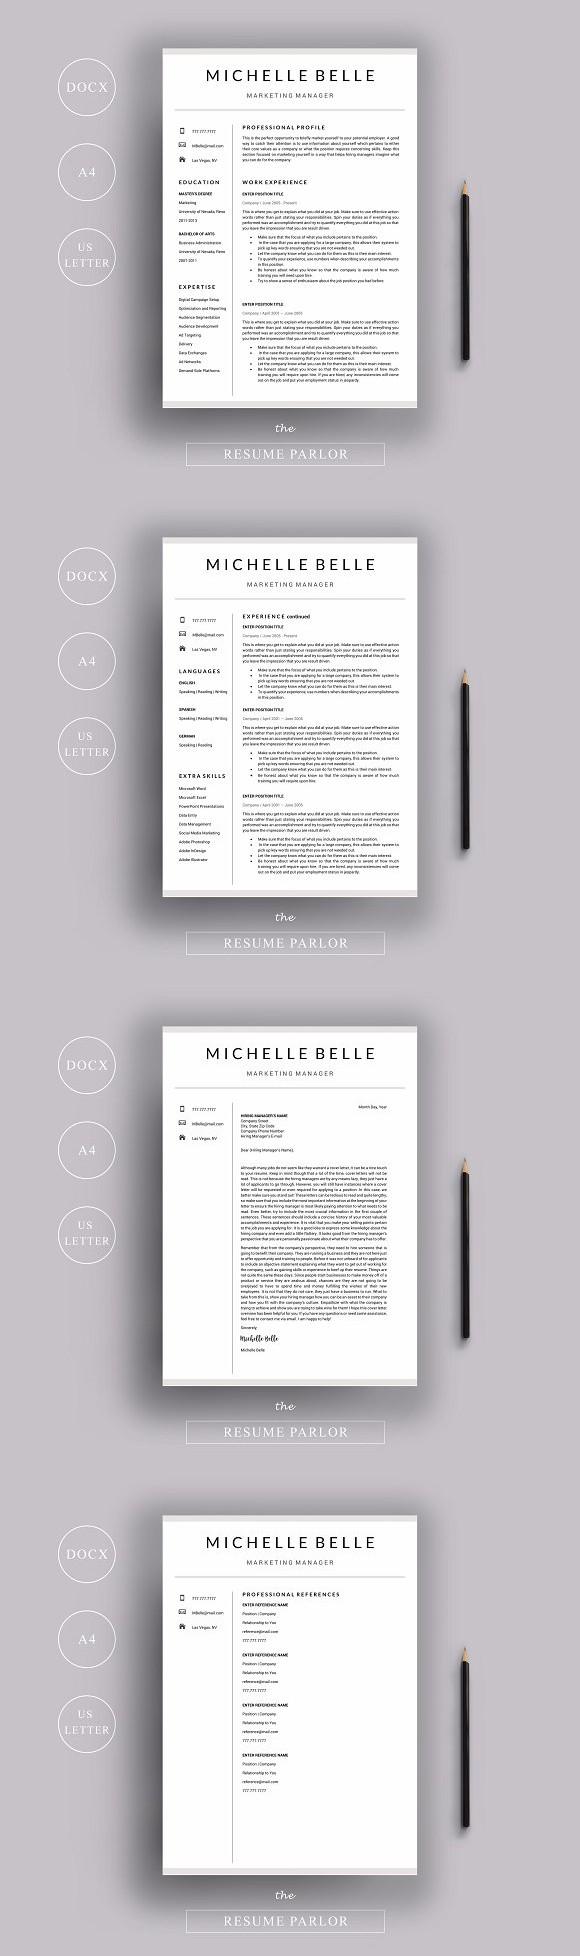 Resume 4 Page A4 + US Letter Sizes. Nursing Resume. 15